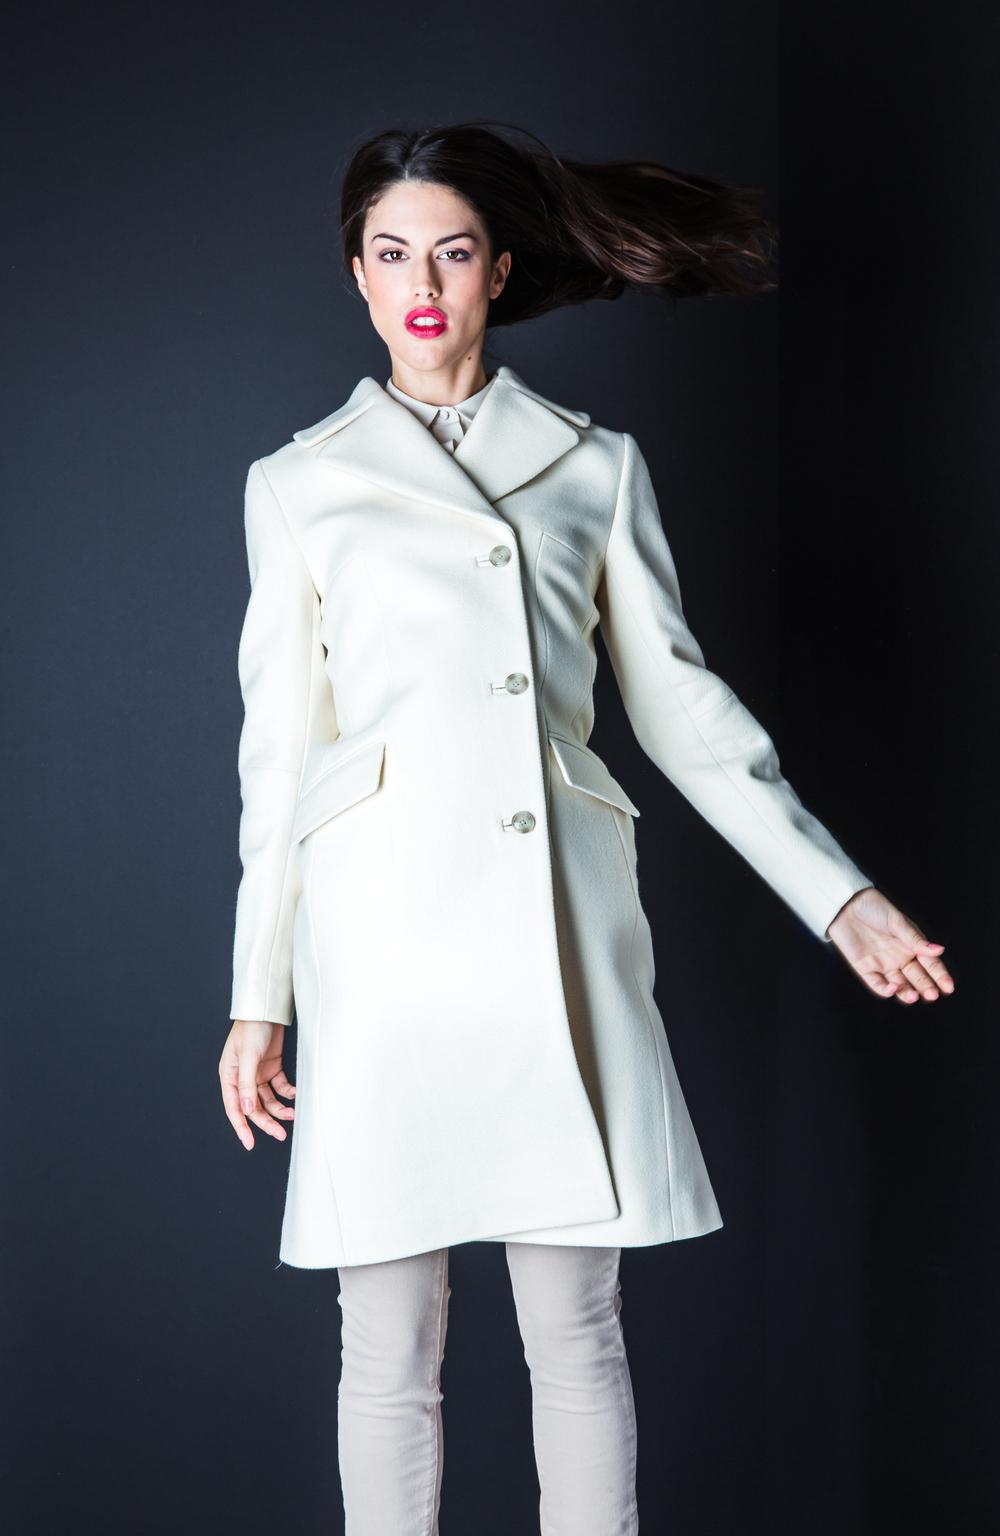 Featuring J.Lindeberg Gigi Twill Melton Jacket $609, Paige Denim Edgemont Ultra Skinny Jeans $309